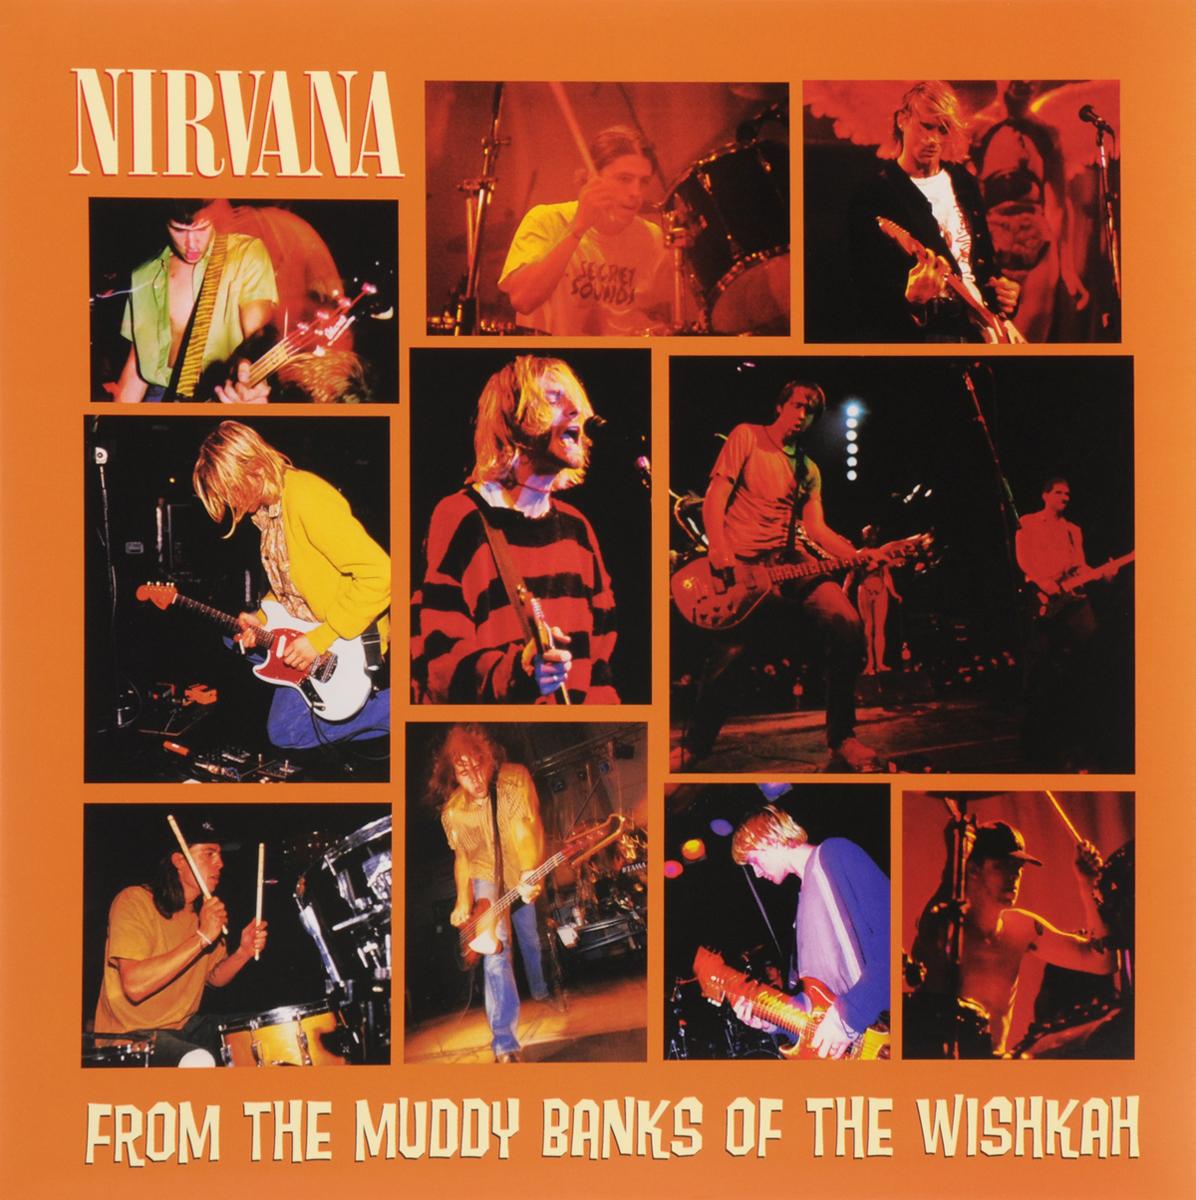 Nirvana Nirvana. From The Muddy Banks Of The Wishkah (2 LP) nirvana nirvana live at the paramount 2 lp